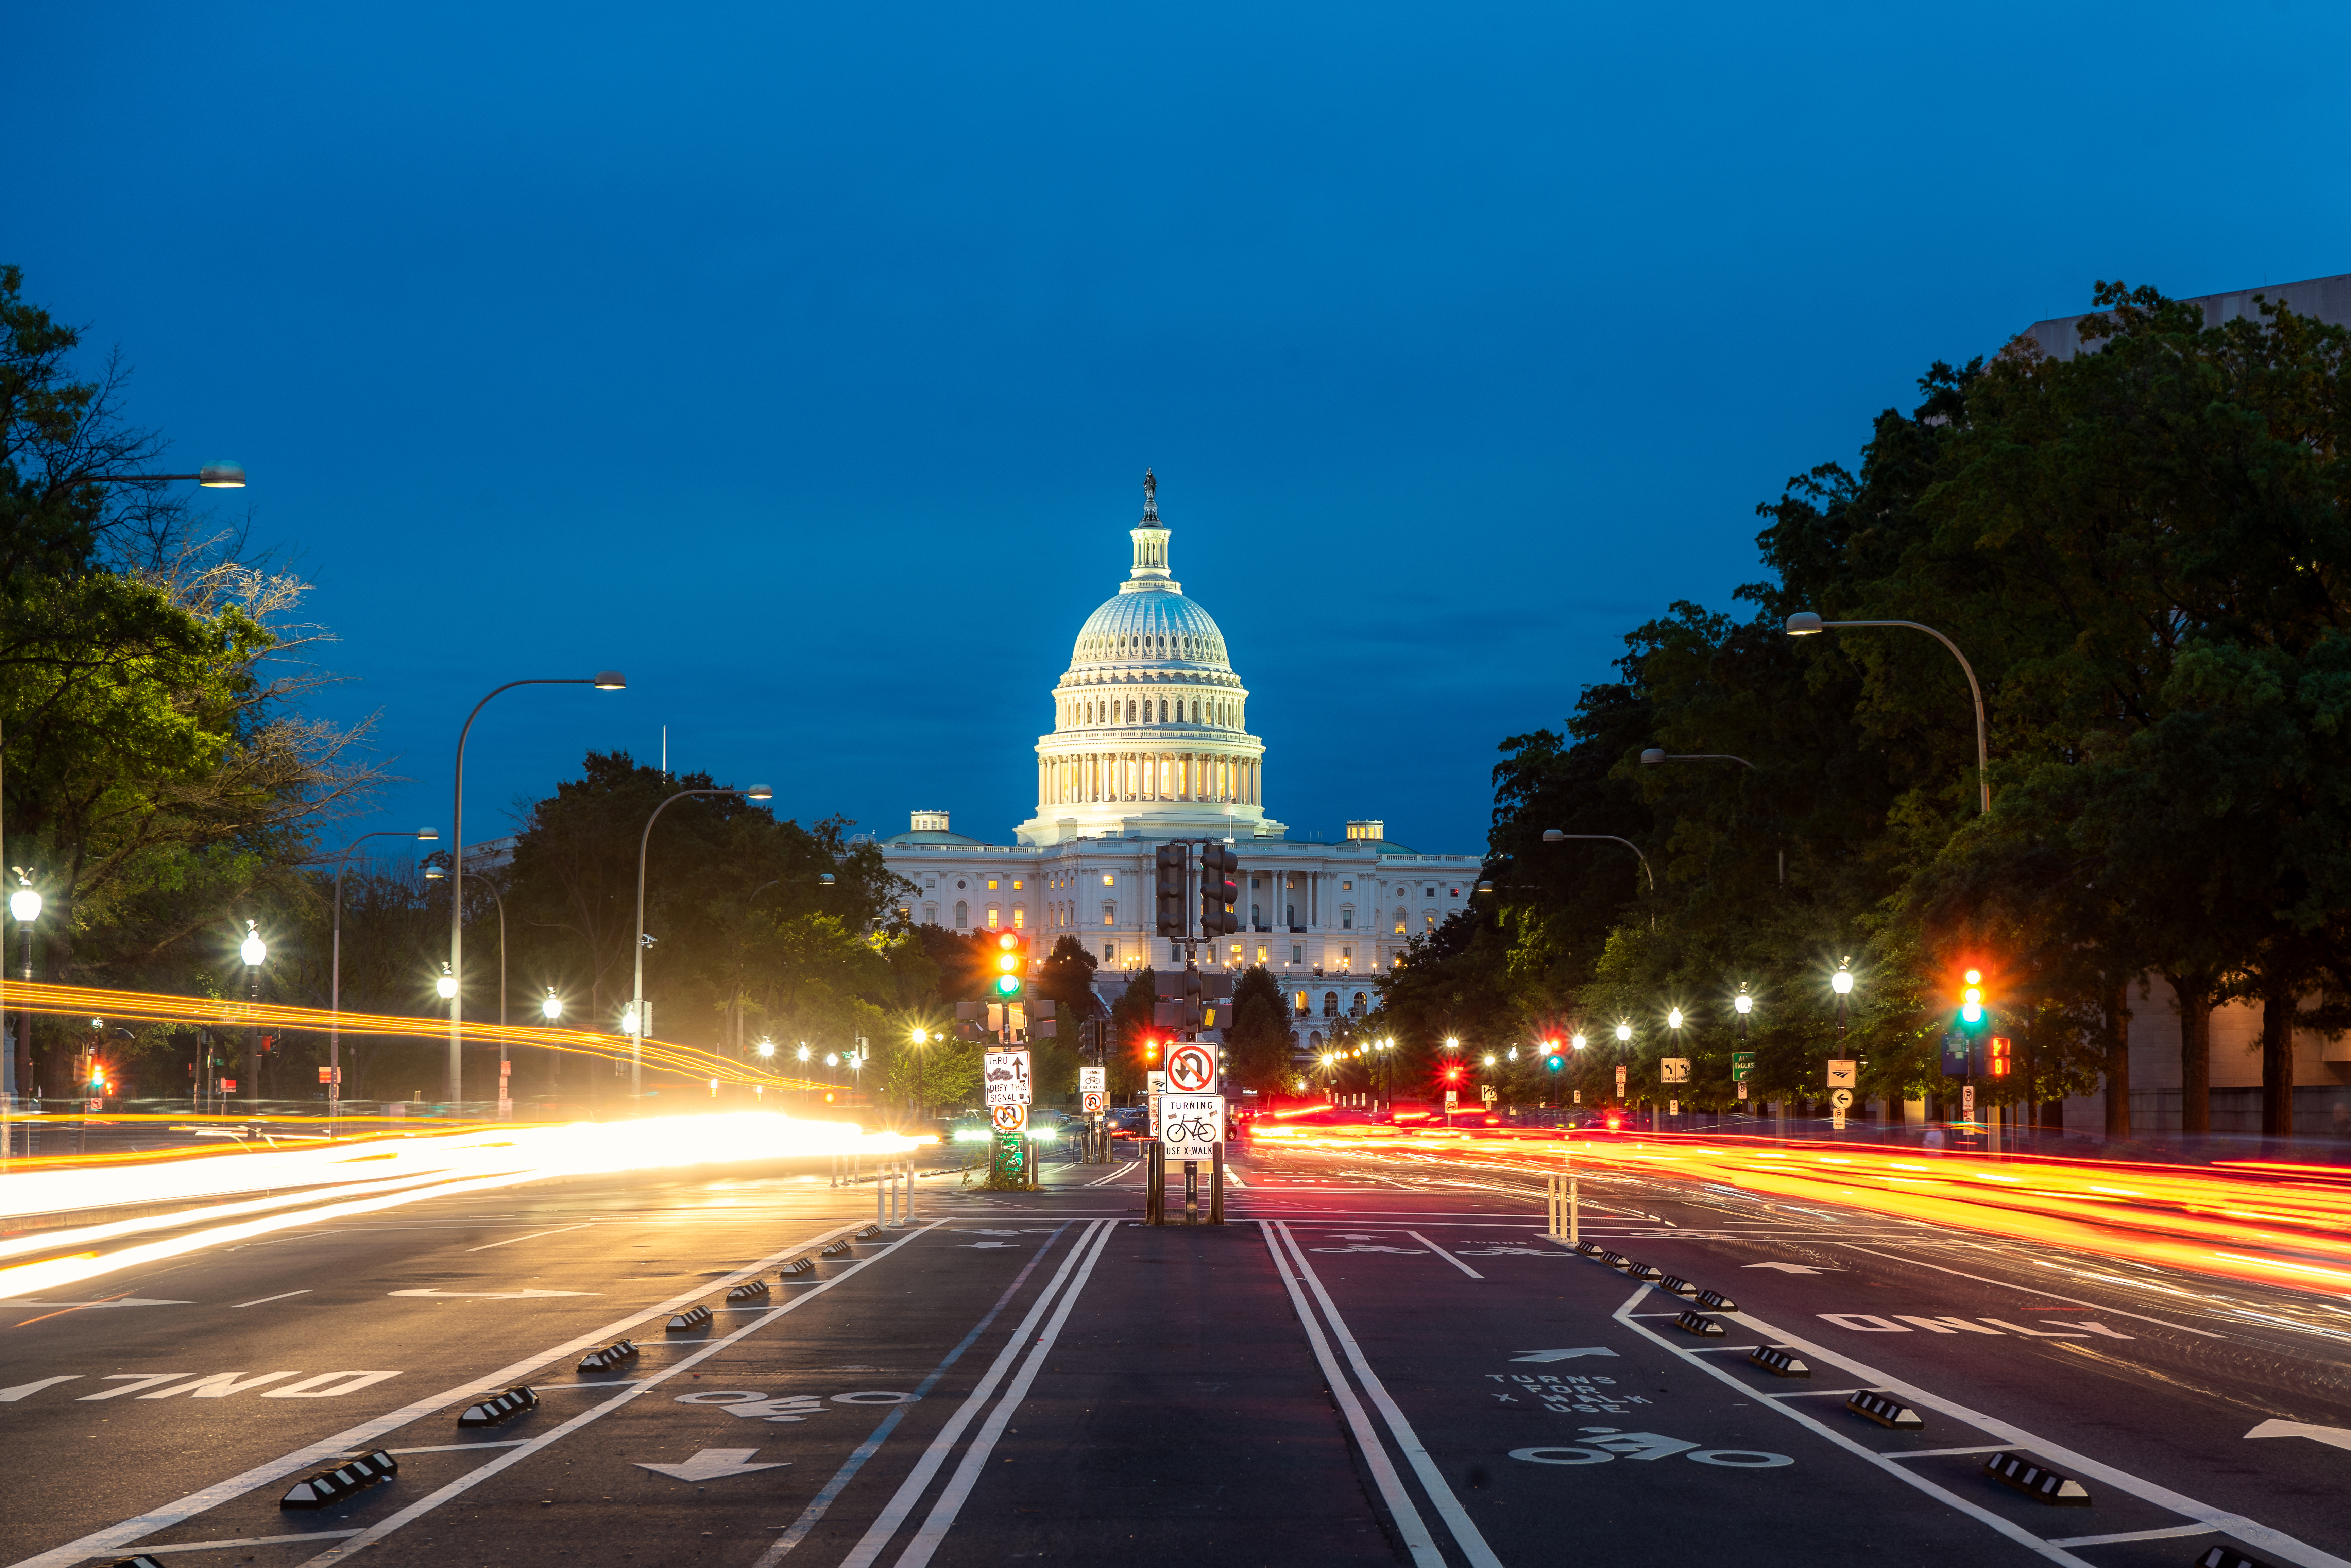 Downtown Washington, D.C., at night